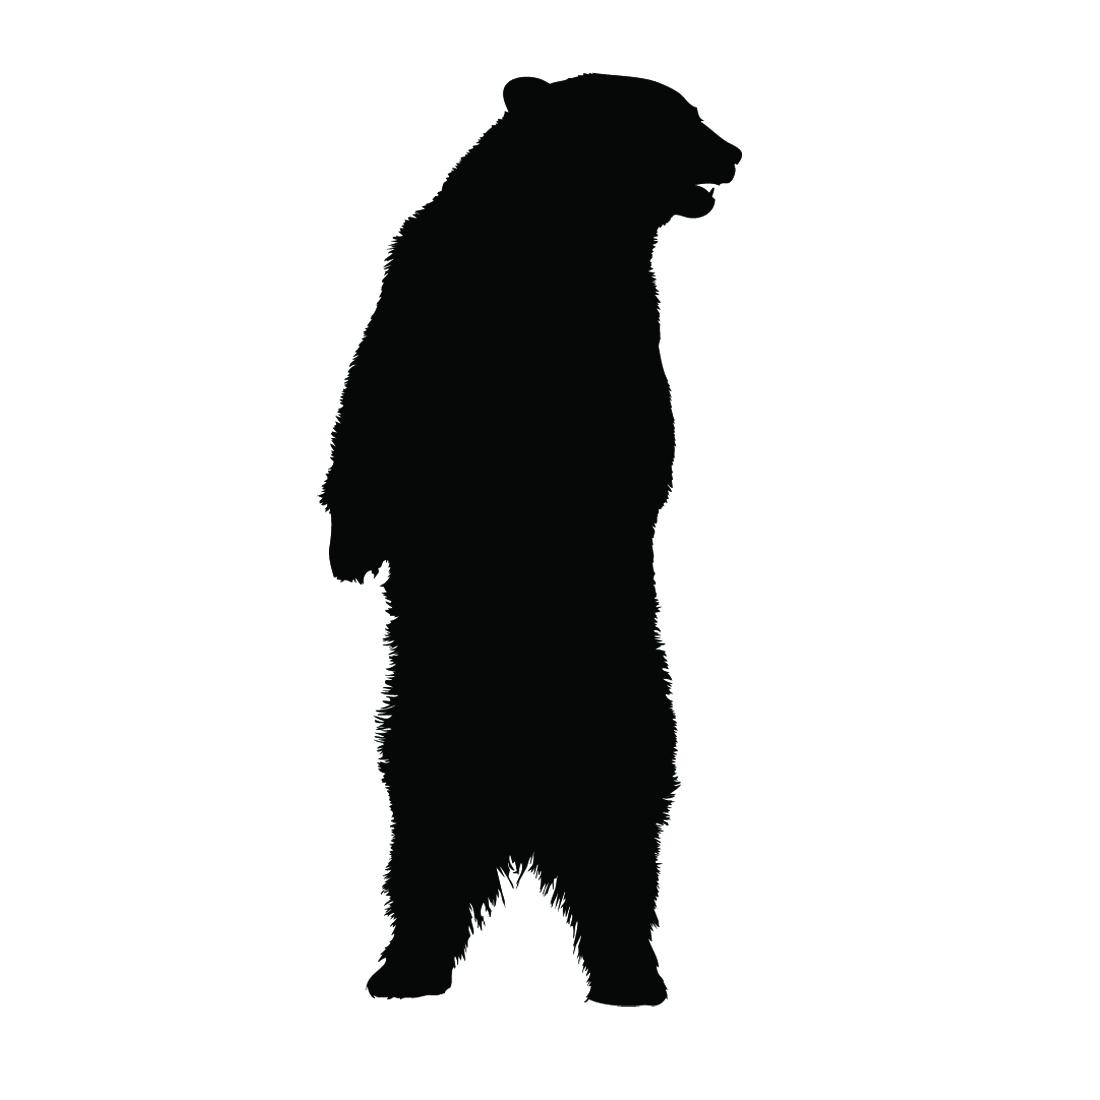 1100x1100 Bear Standing Silhouette Stencil Free Stencil Gallery